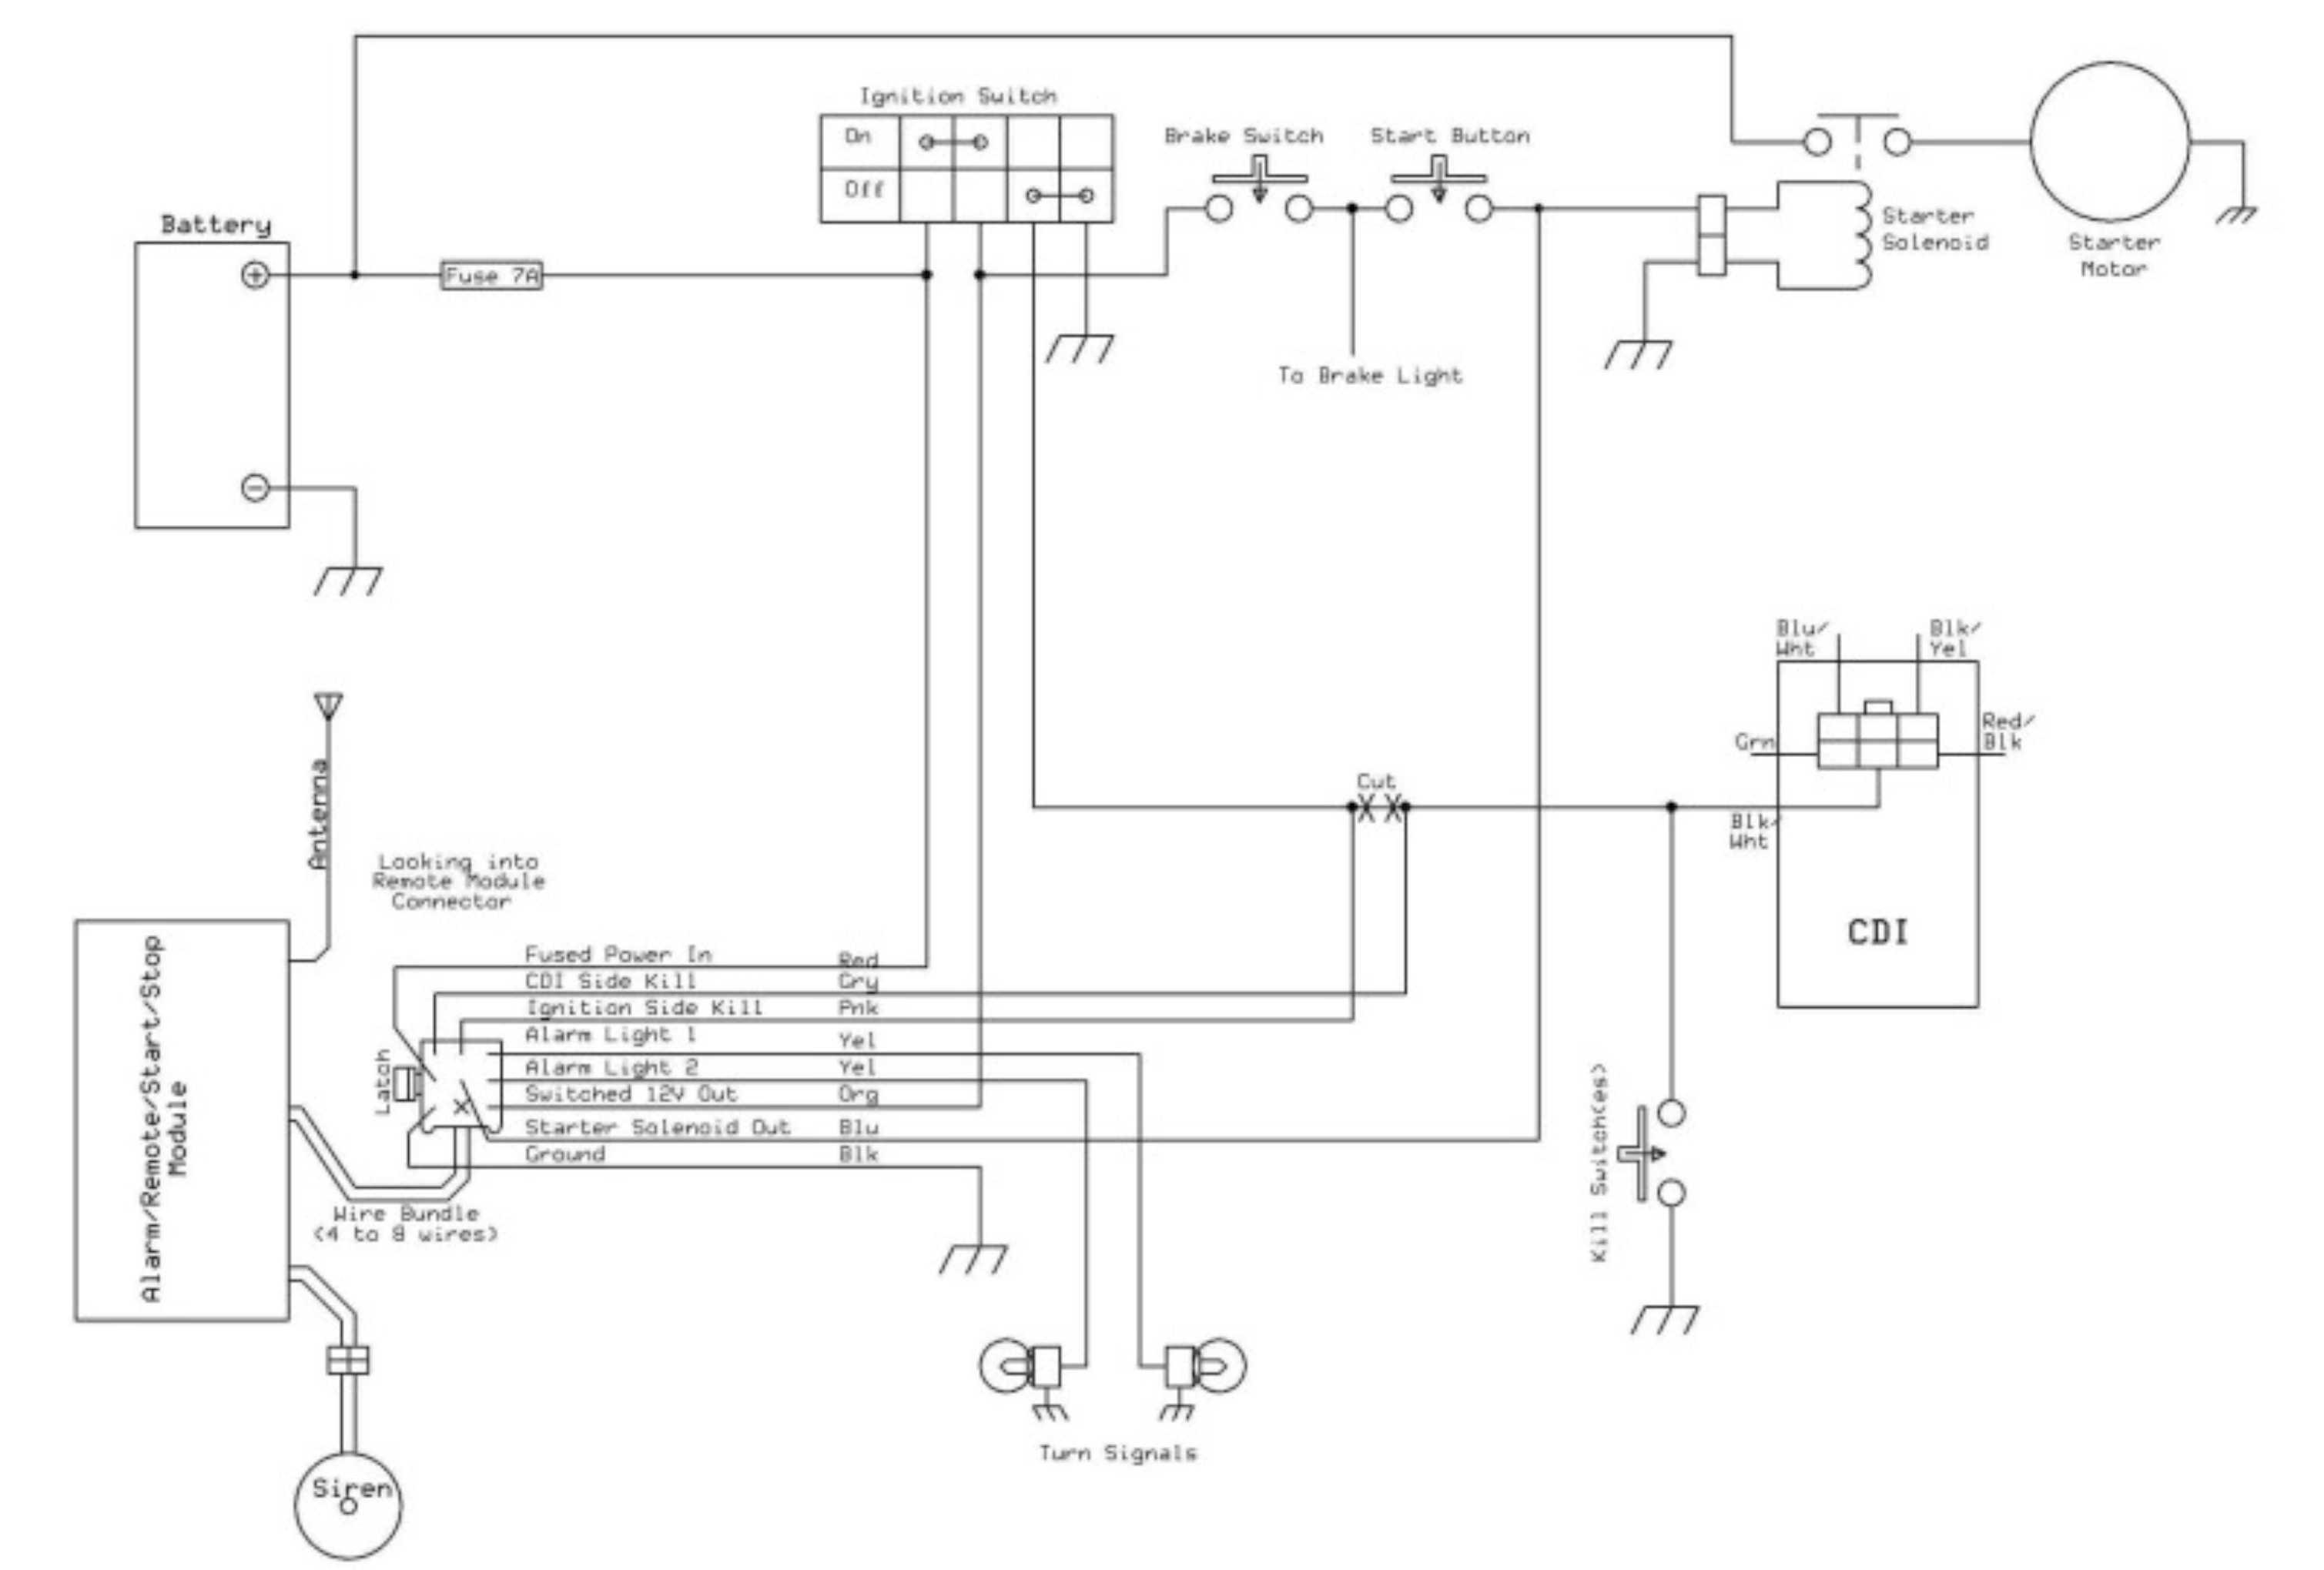 Ignition Wiring Diagram 250 2 Stroke Wiring Diagram Engine Engine Graniantichiumbri It